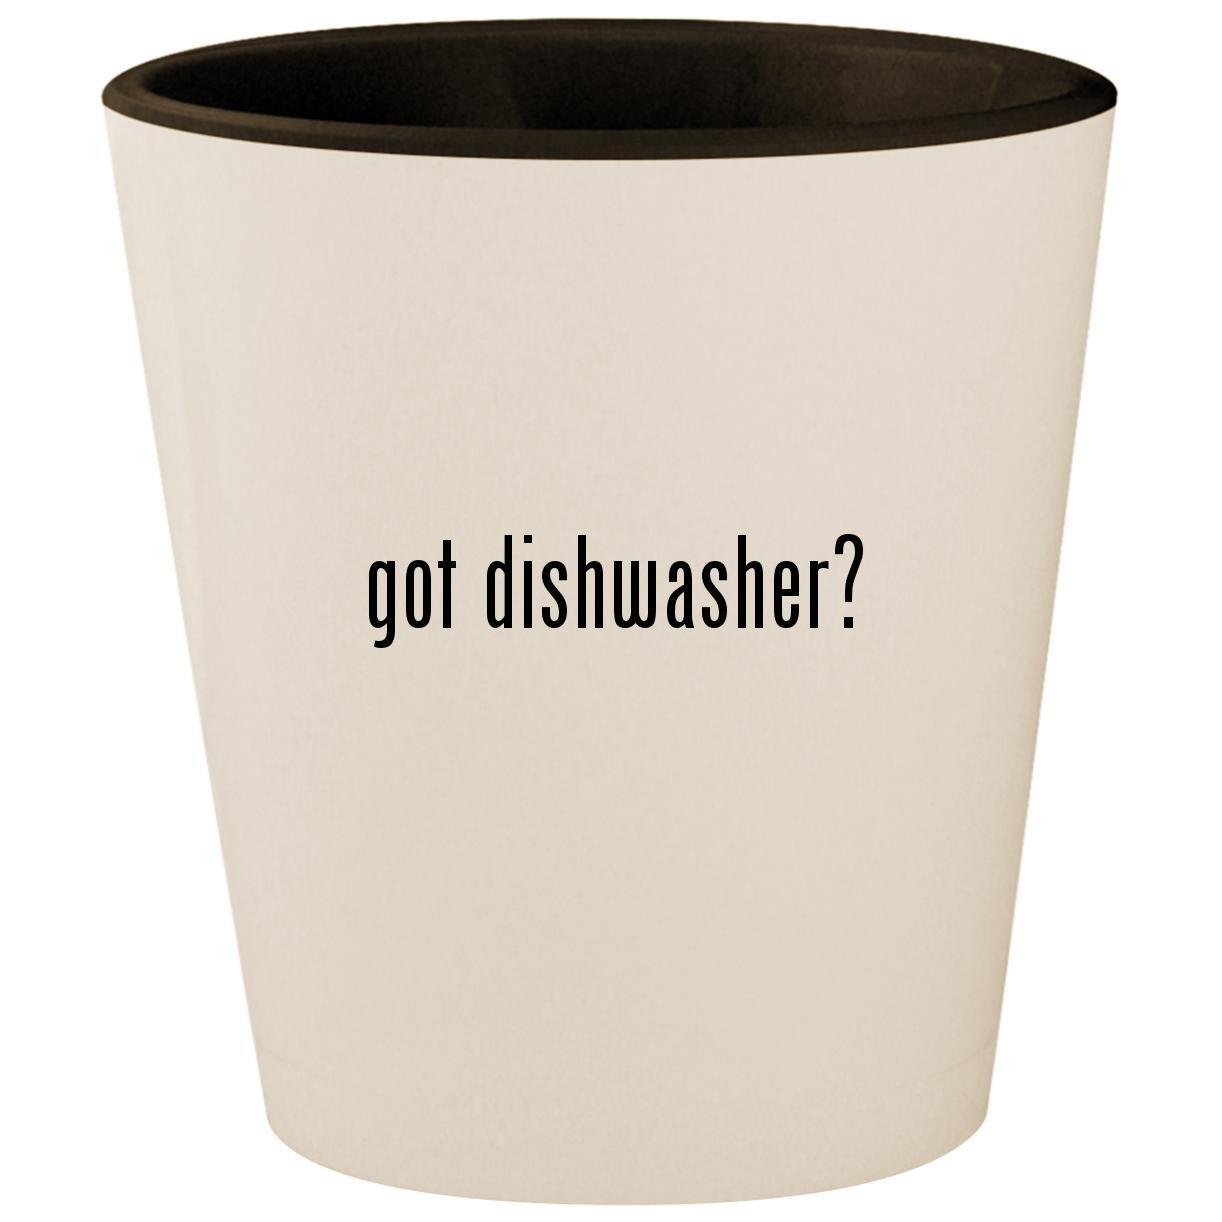 got dishwasher? - White Outer & Black Inner Ceramic 1.5oz Shot Glass